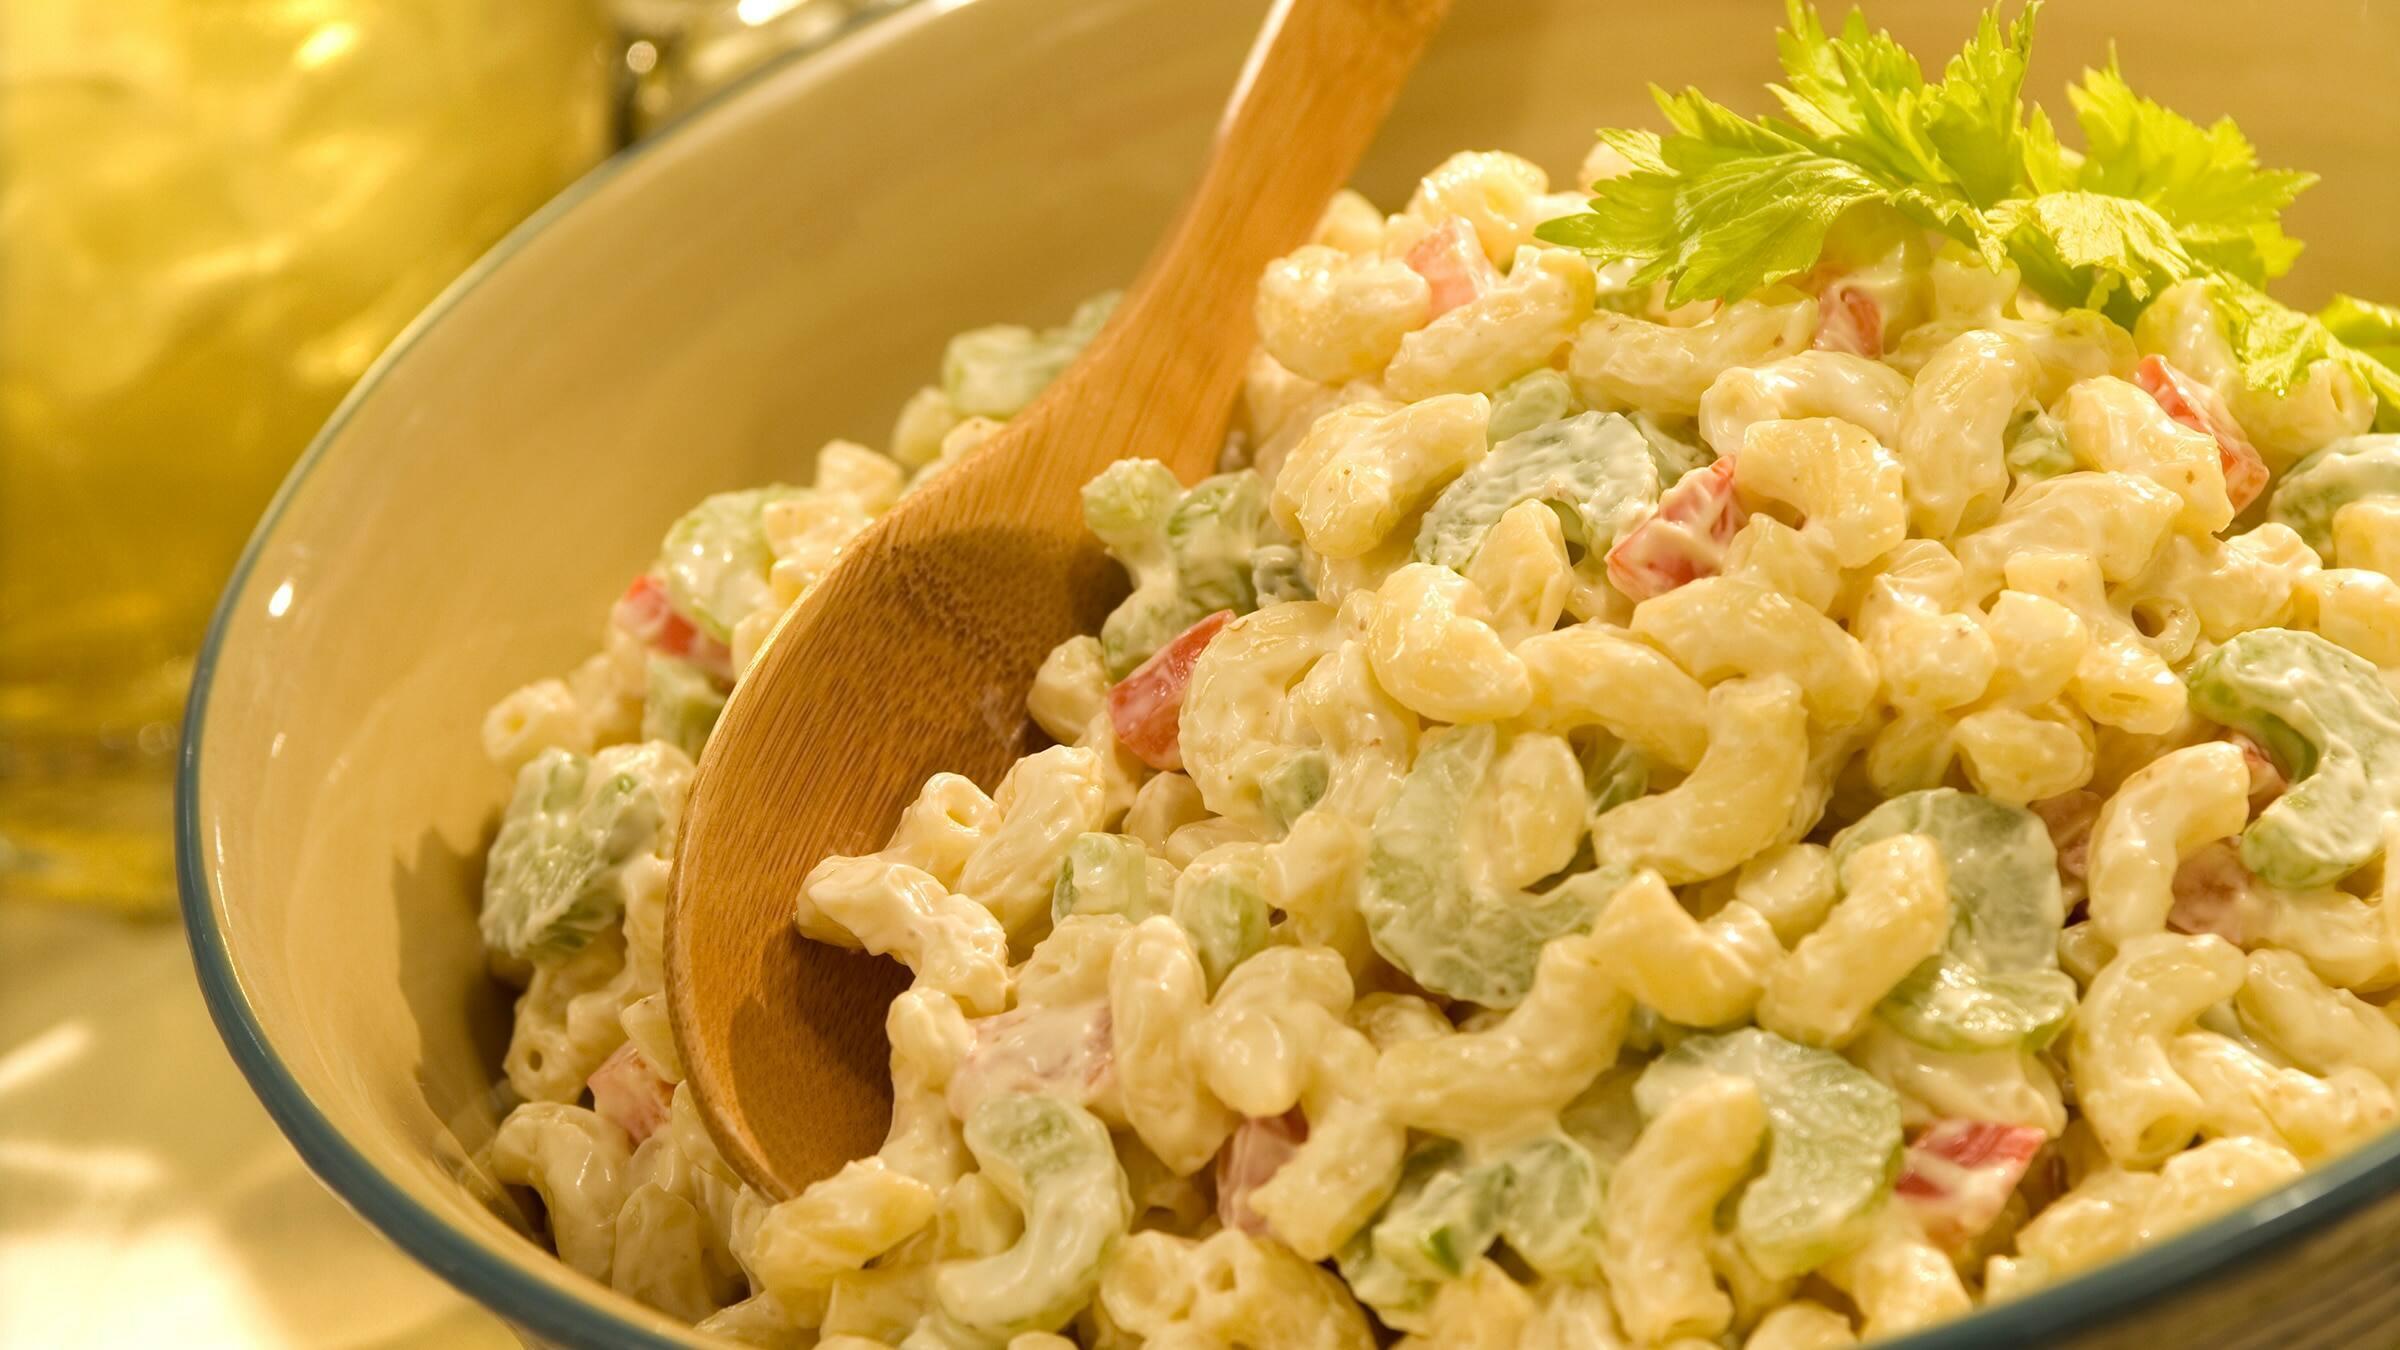 Watch Macaroni Salad video